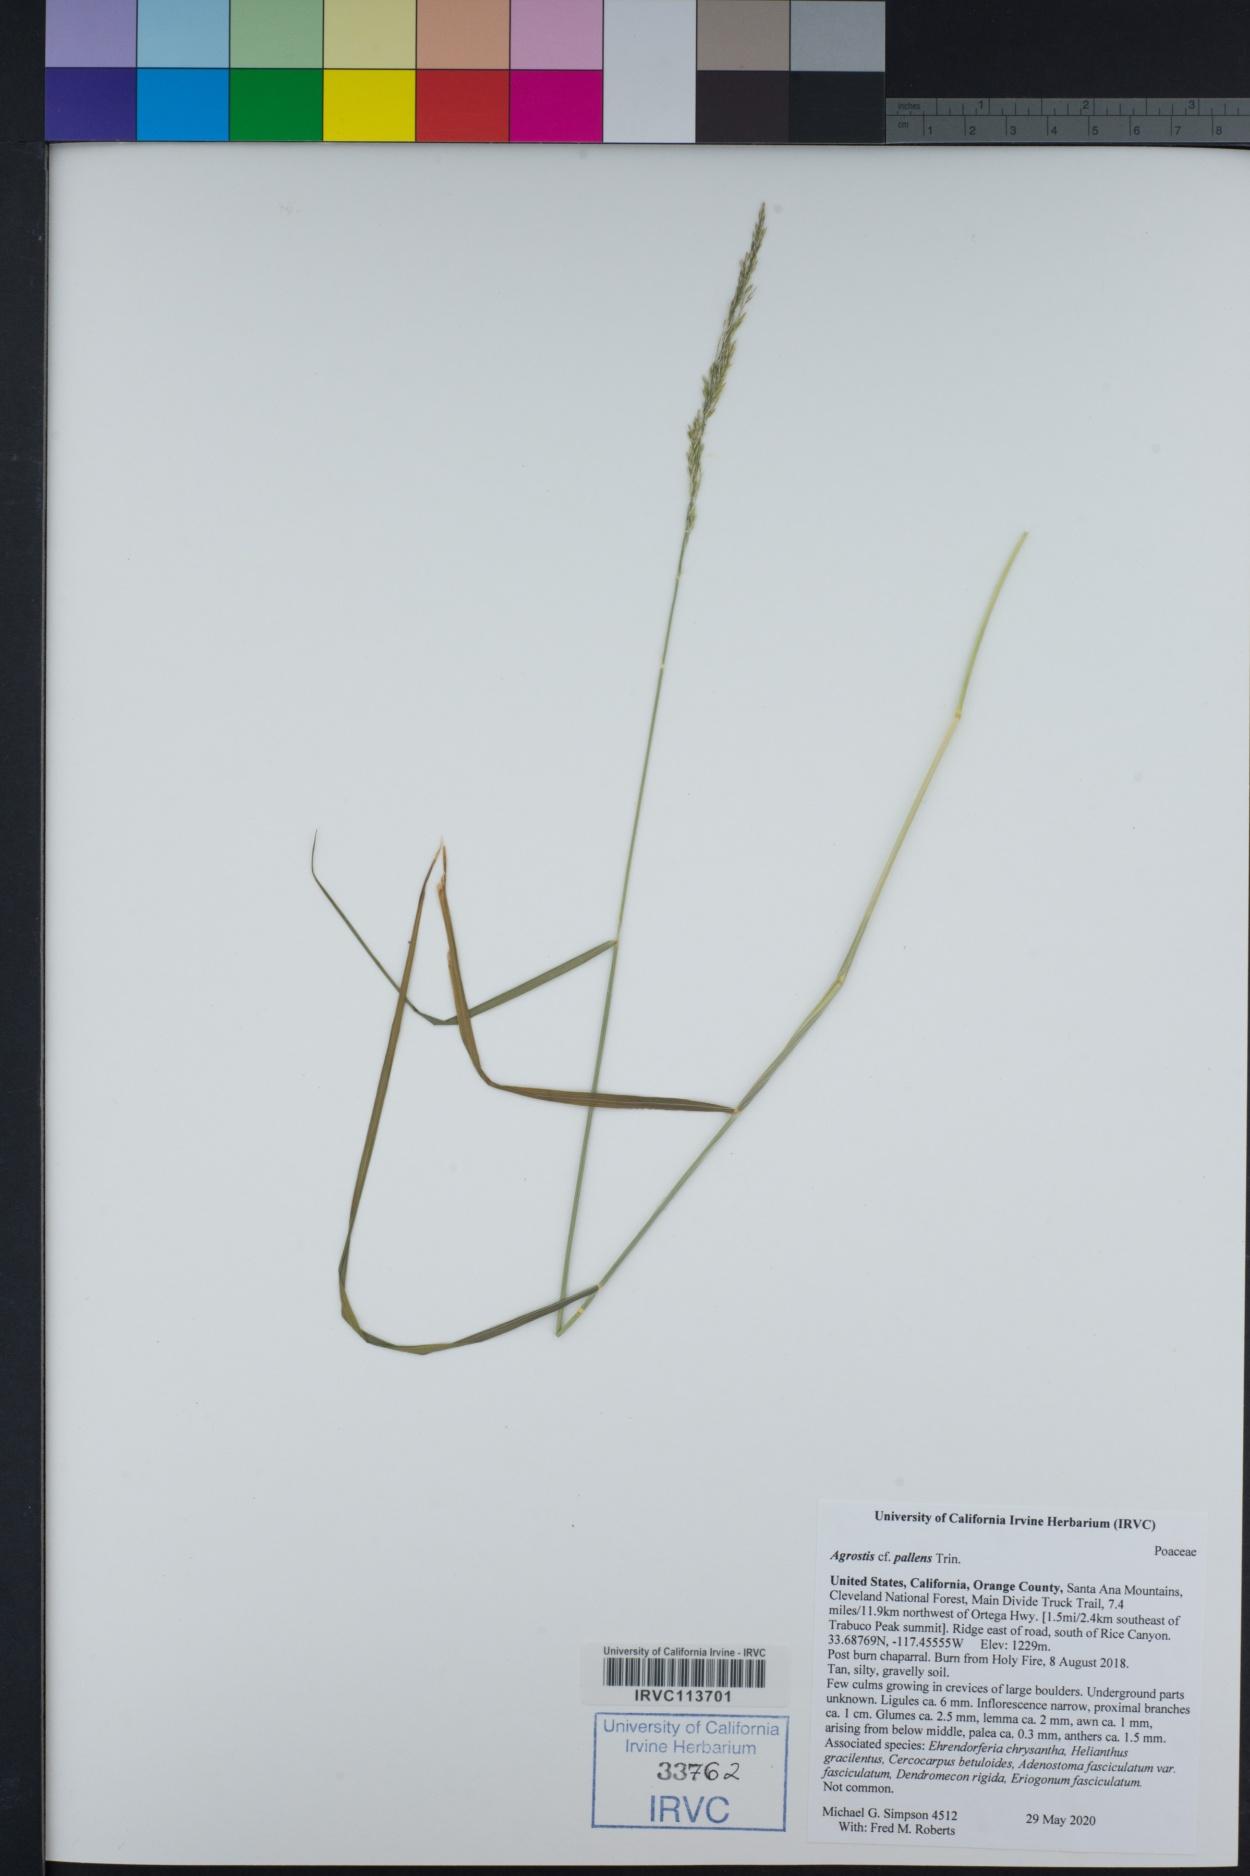 Poaceae image